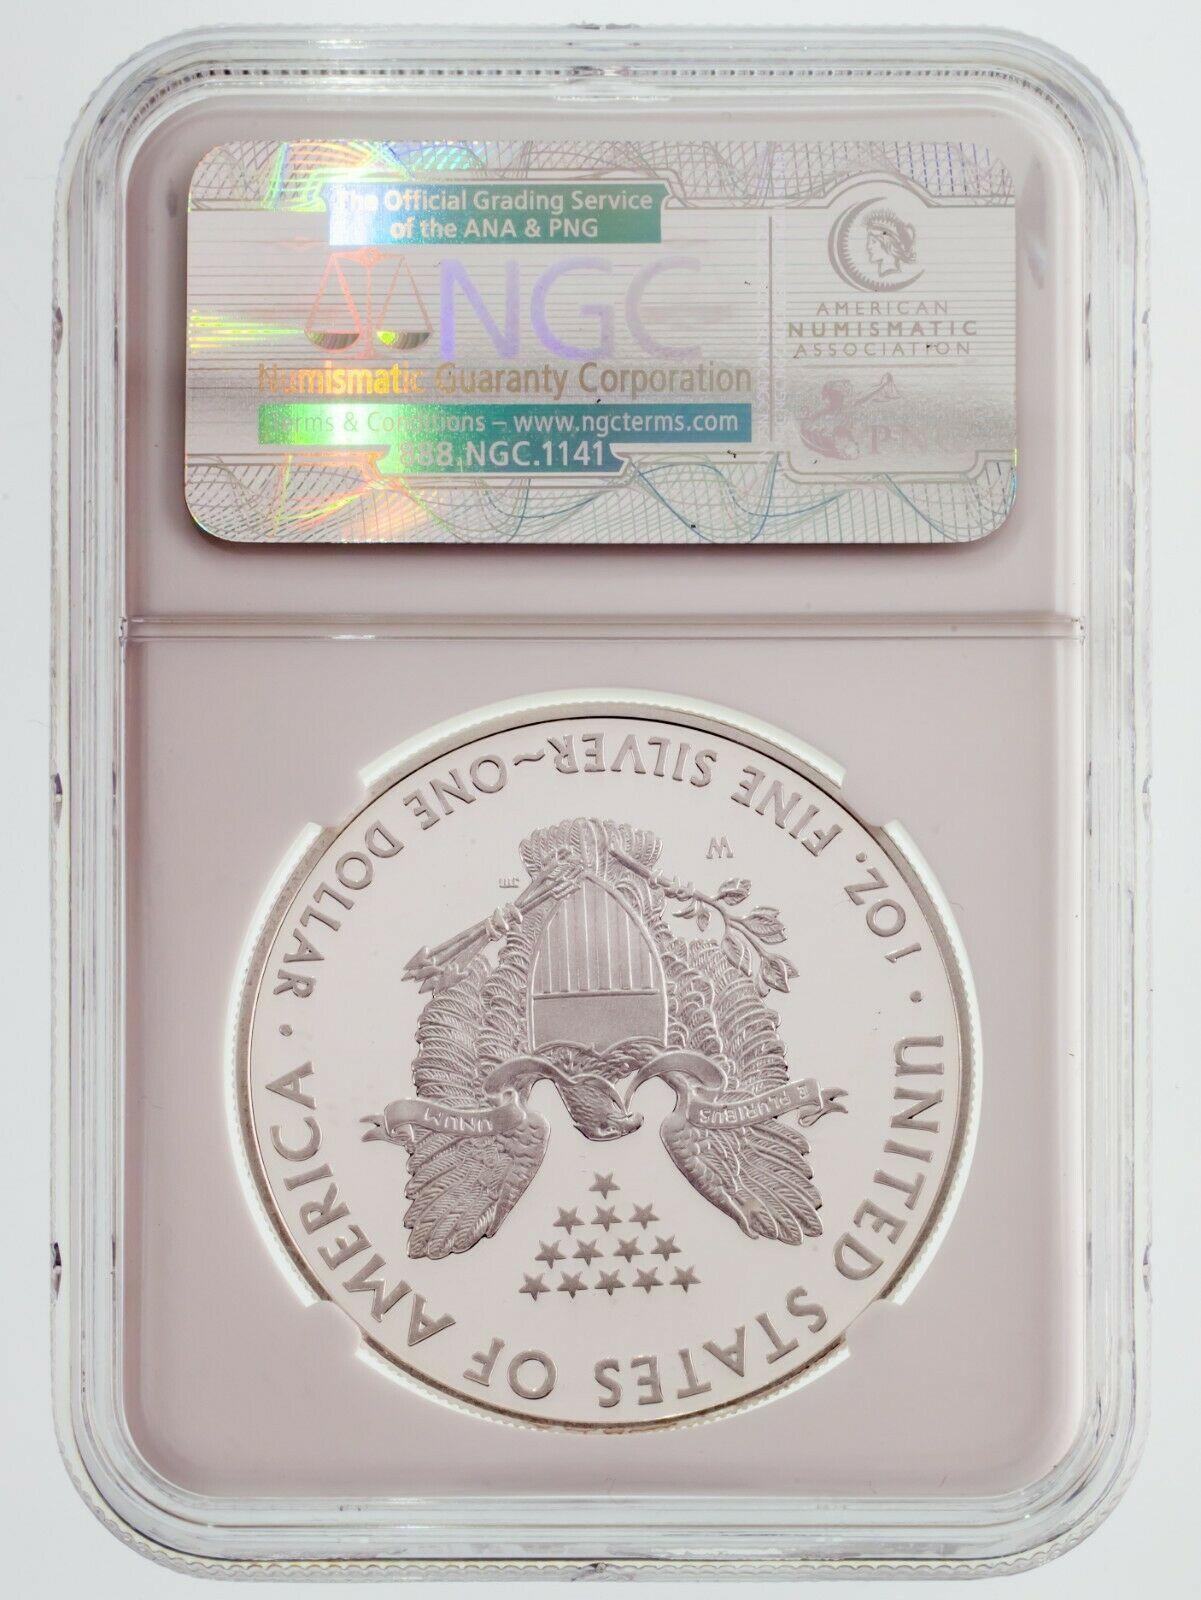 2013-W Silber American Eagle Beweis Ausgewählten von NGC As PF70 Ultra Cameo image 2